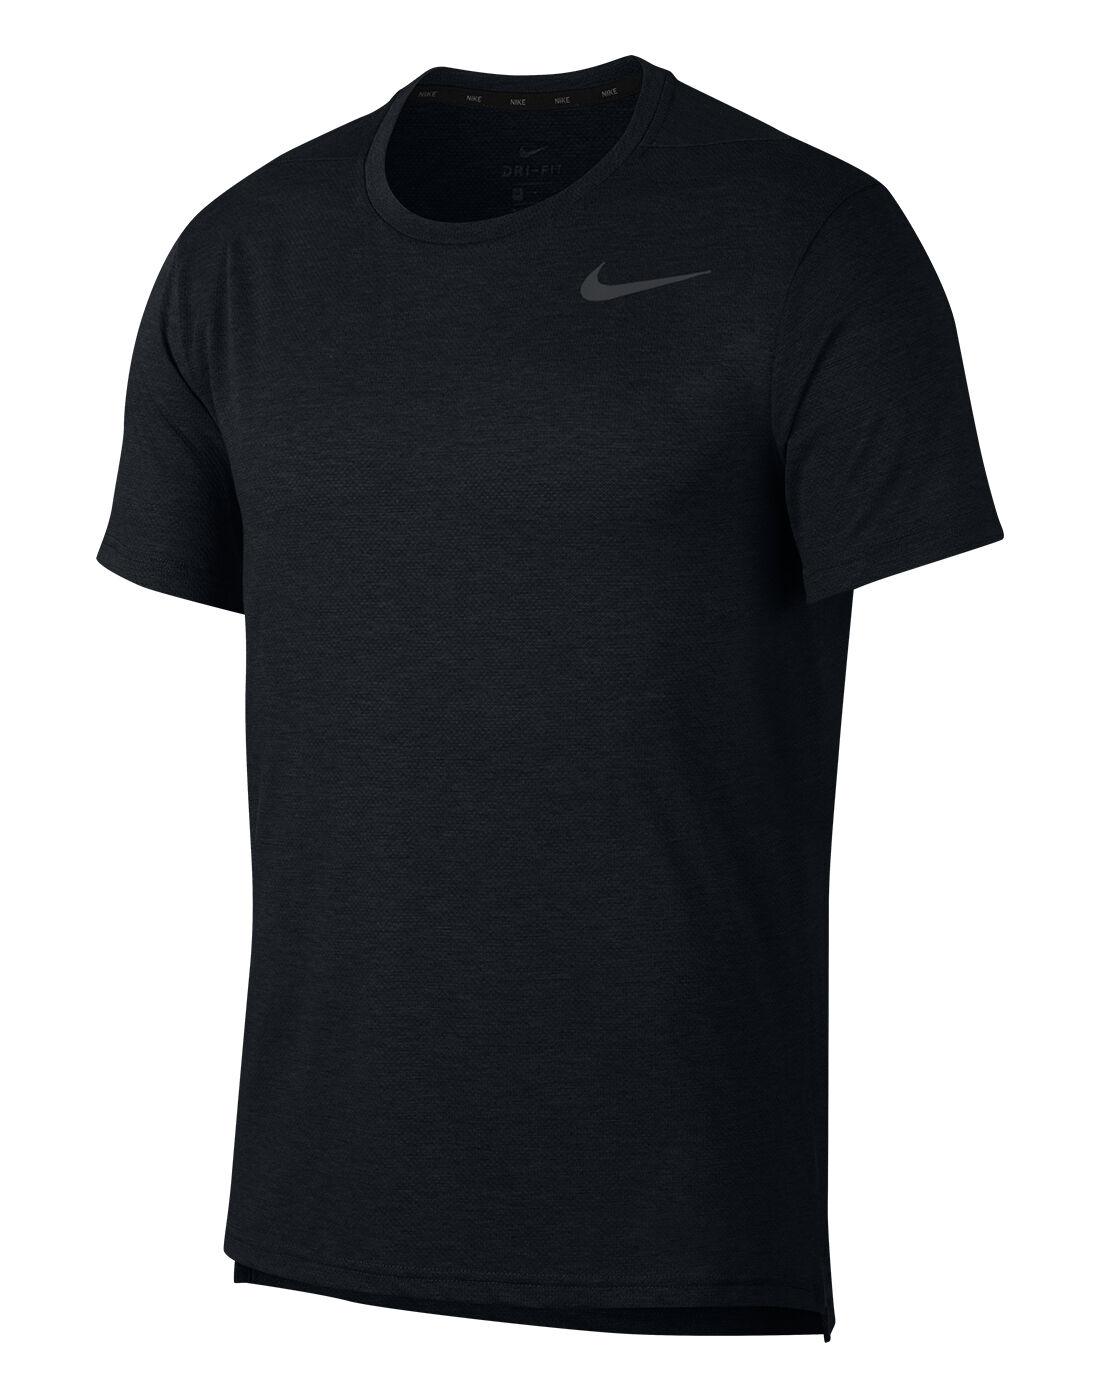 nike shirts for men